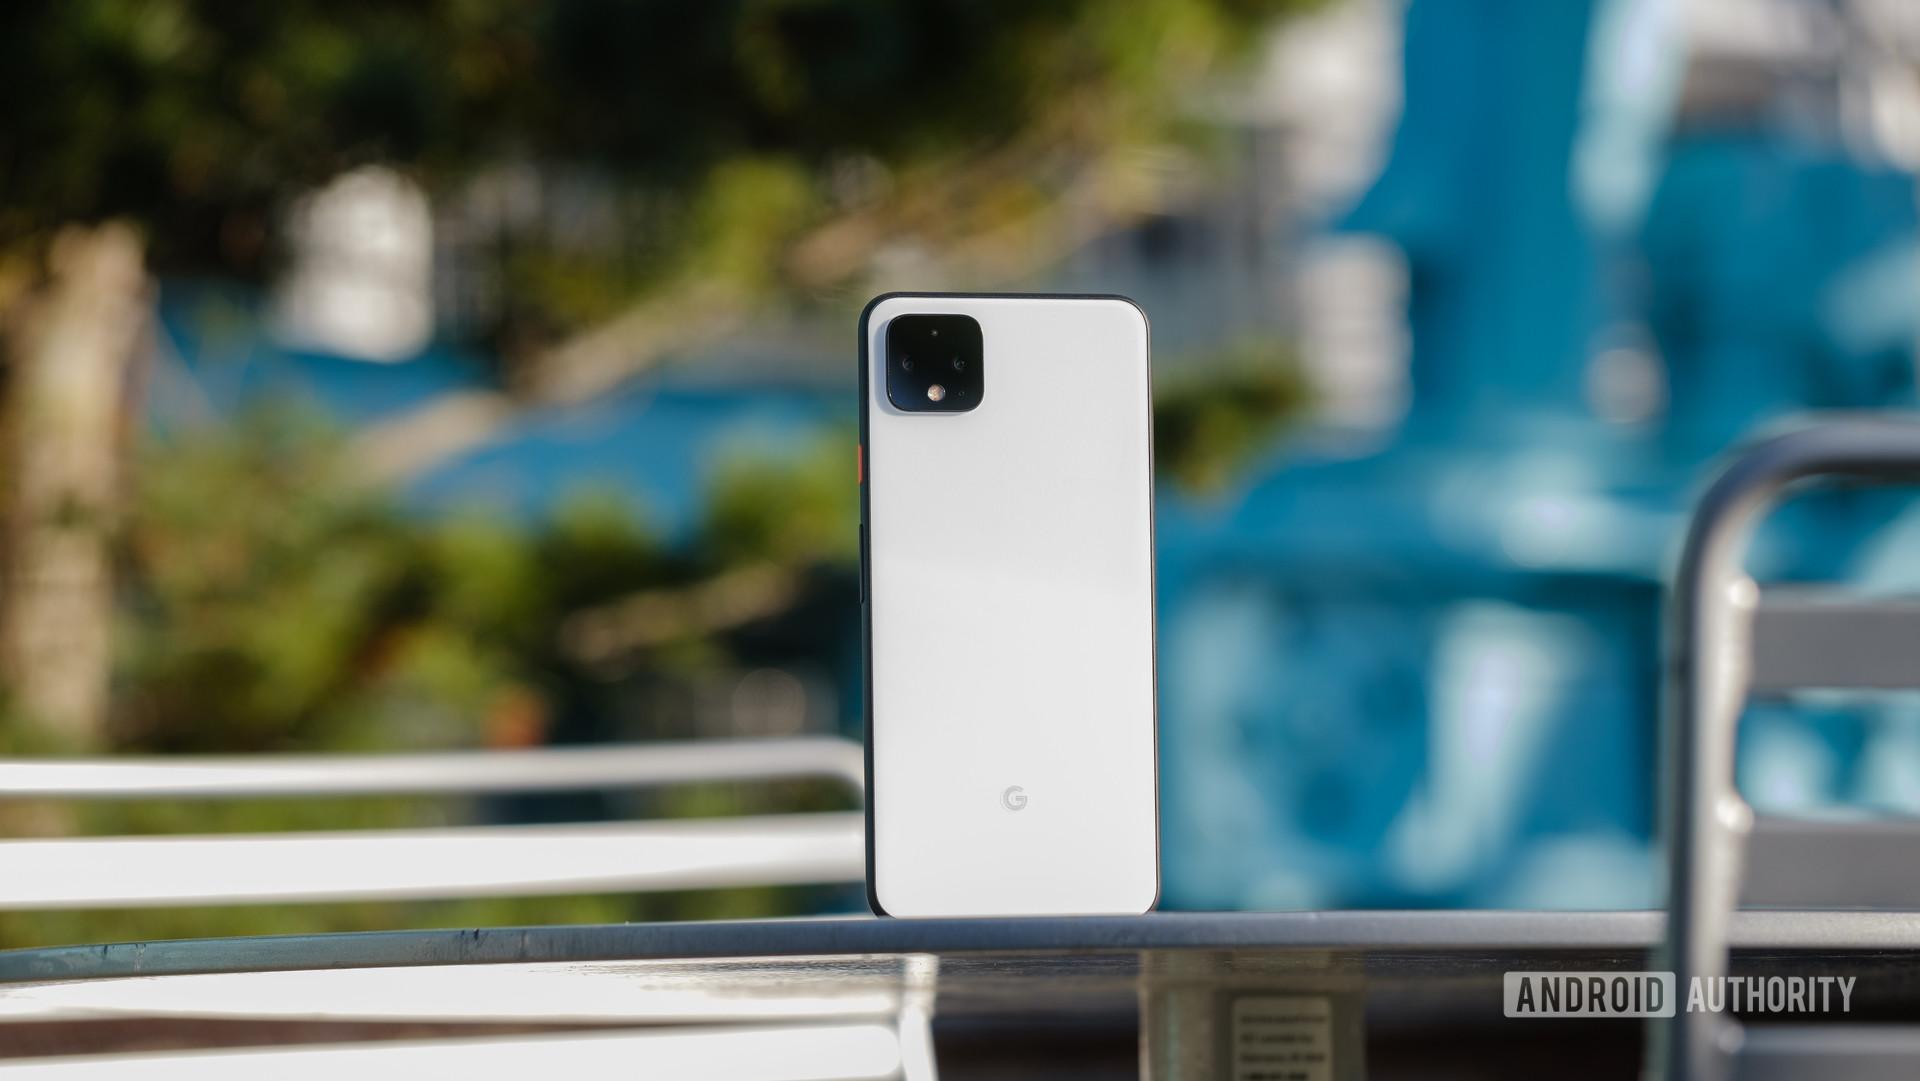 Google Pixel 4 XL back panel on a table 6